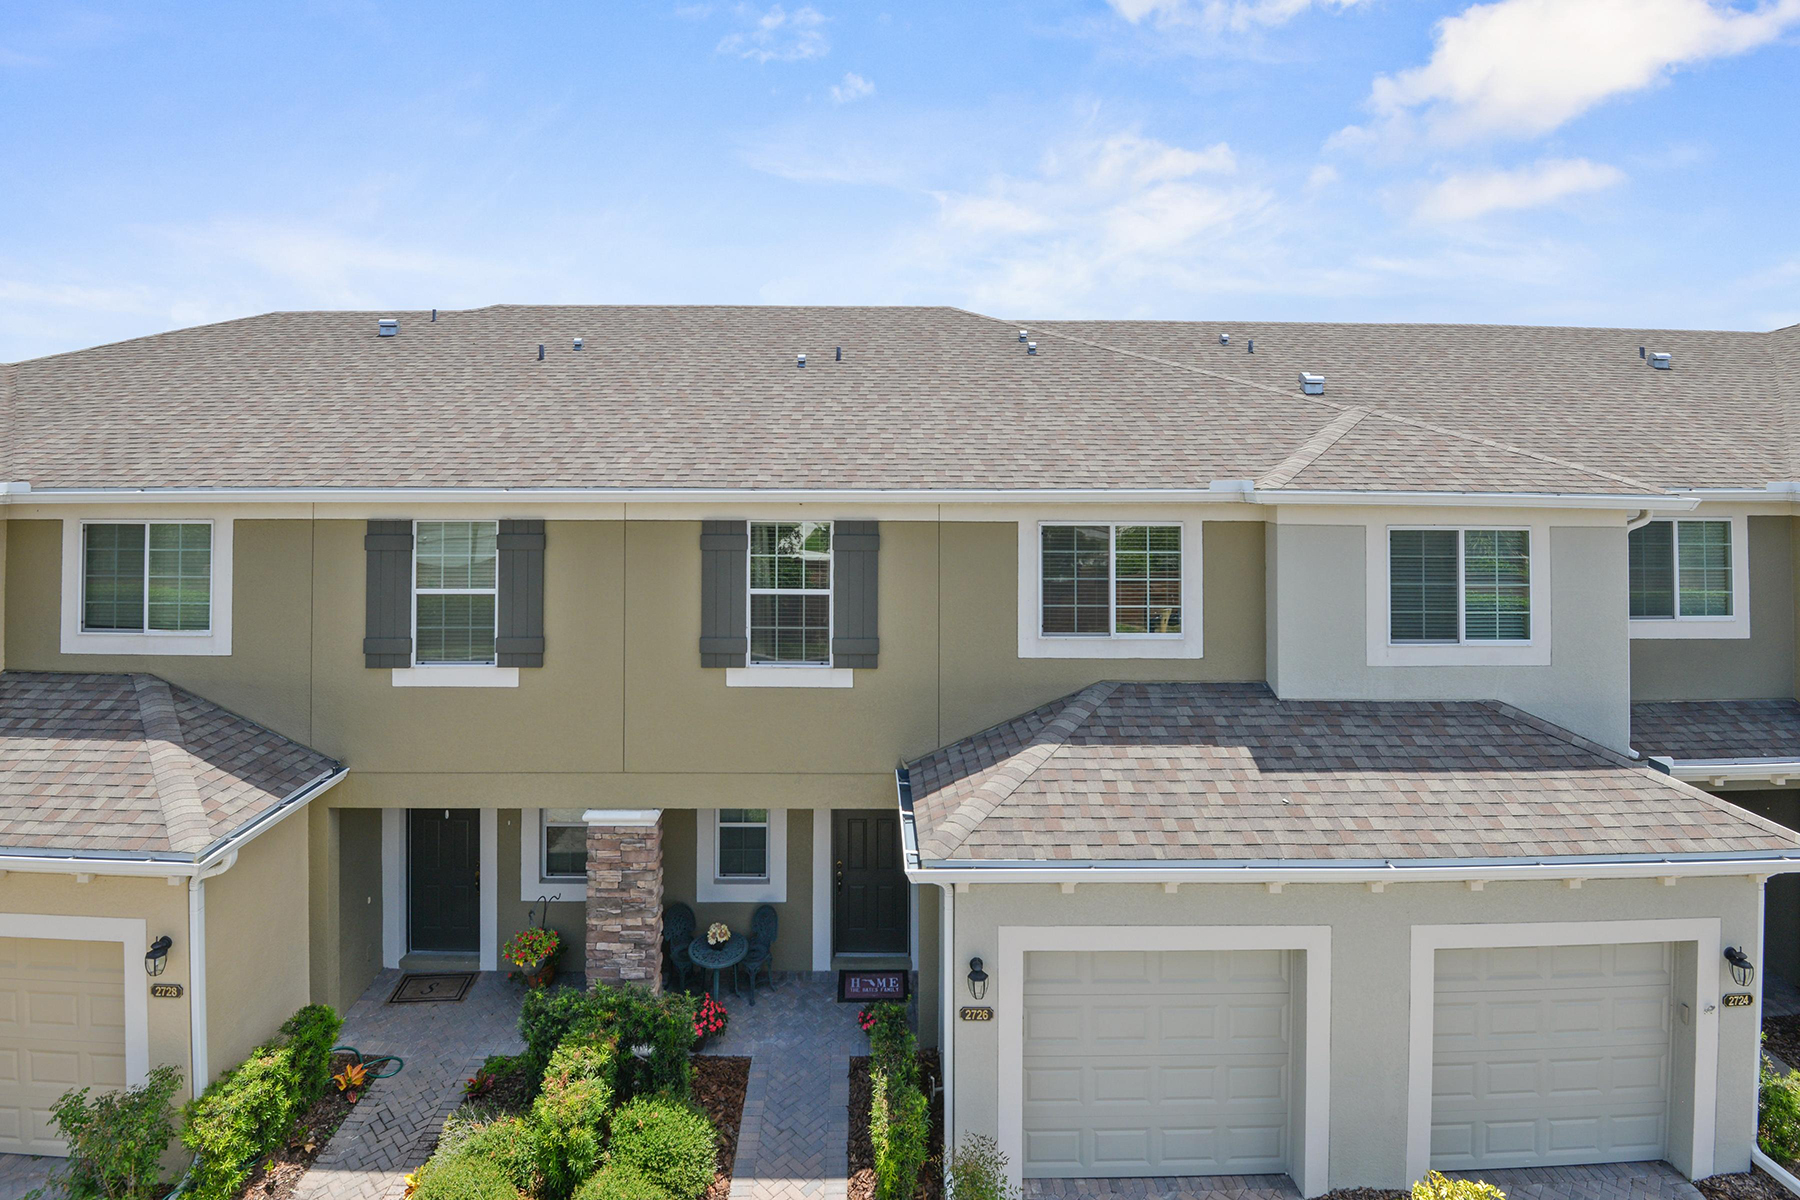 Townhouse for Sale at SANFORD - LAKE MARY 2726 River Landing Dr Sanford, Florida, 32771 United States